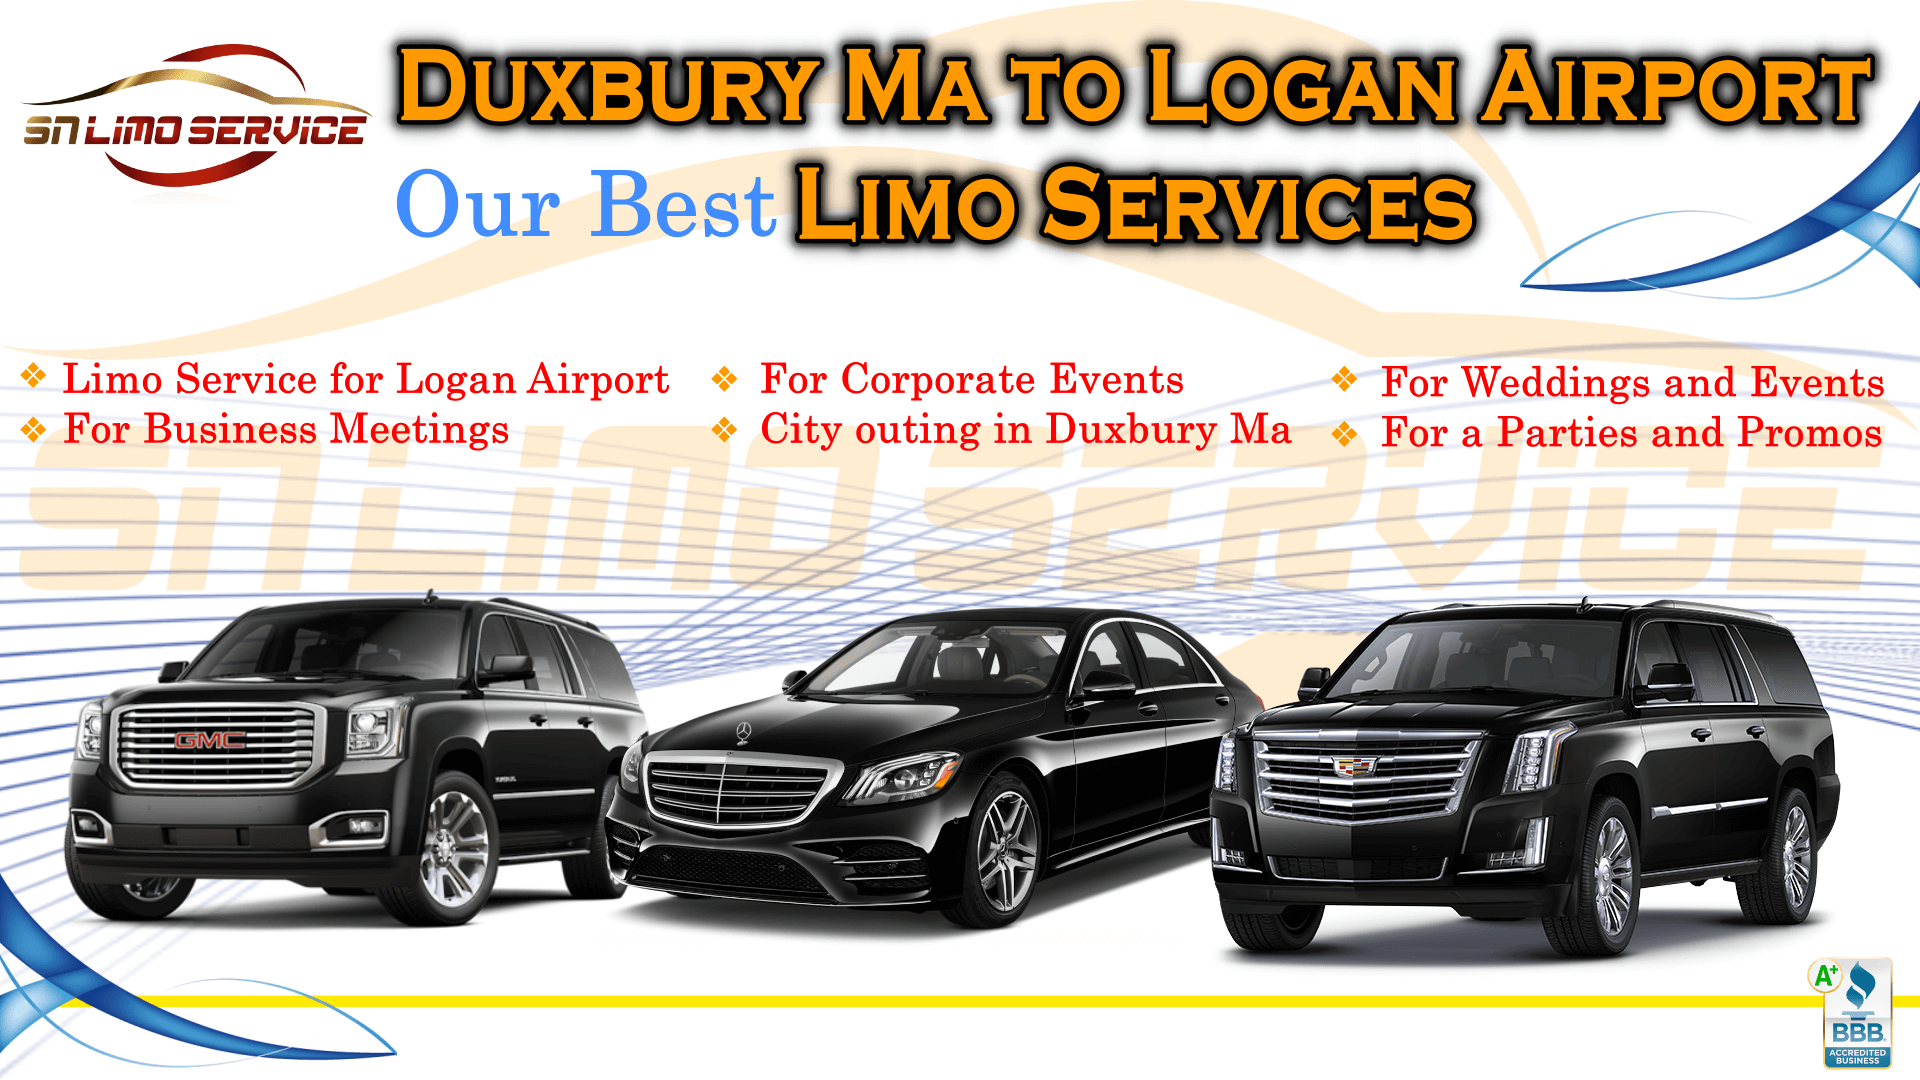 Duxbury Ma to Logan Airport Limo Service Near me South